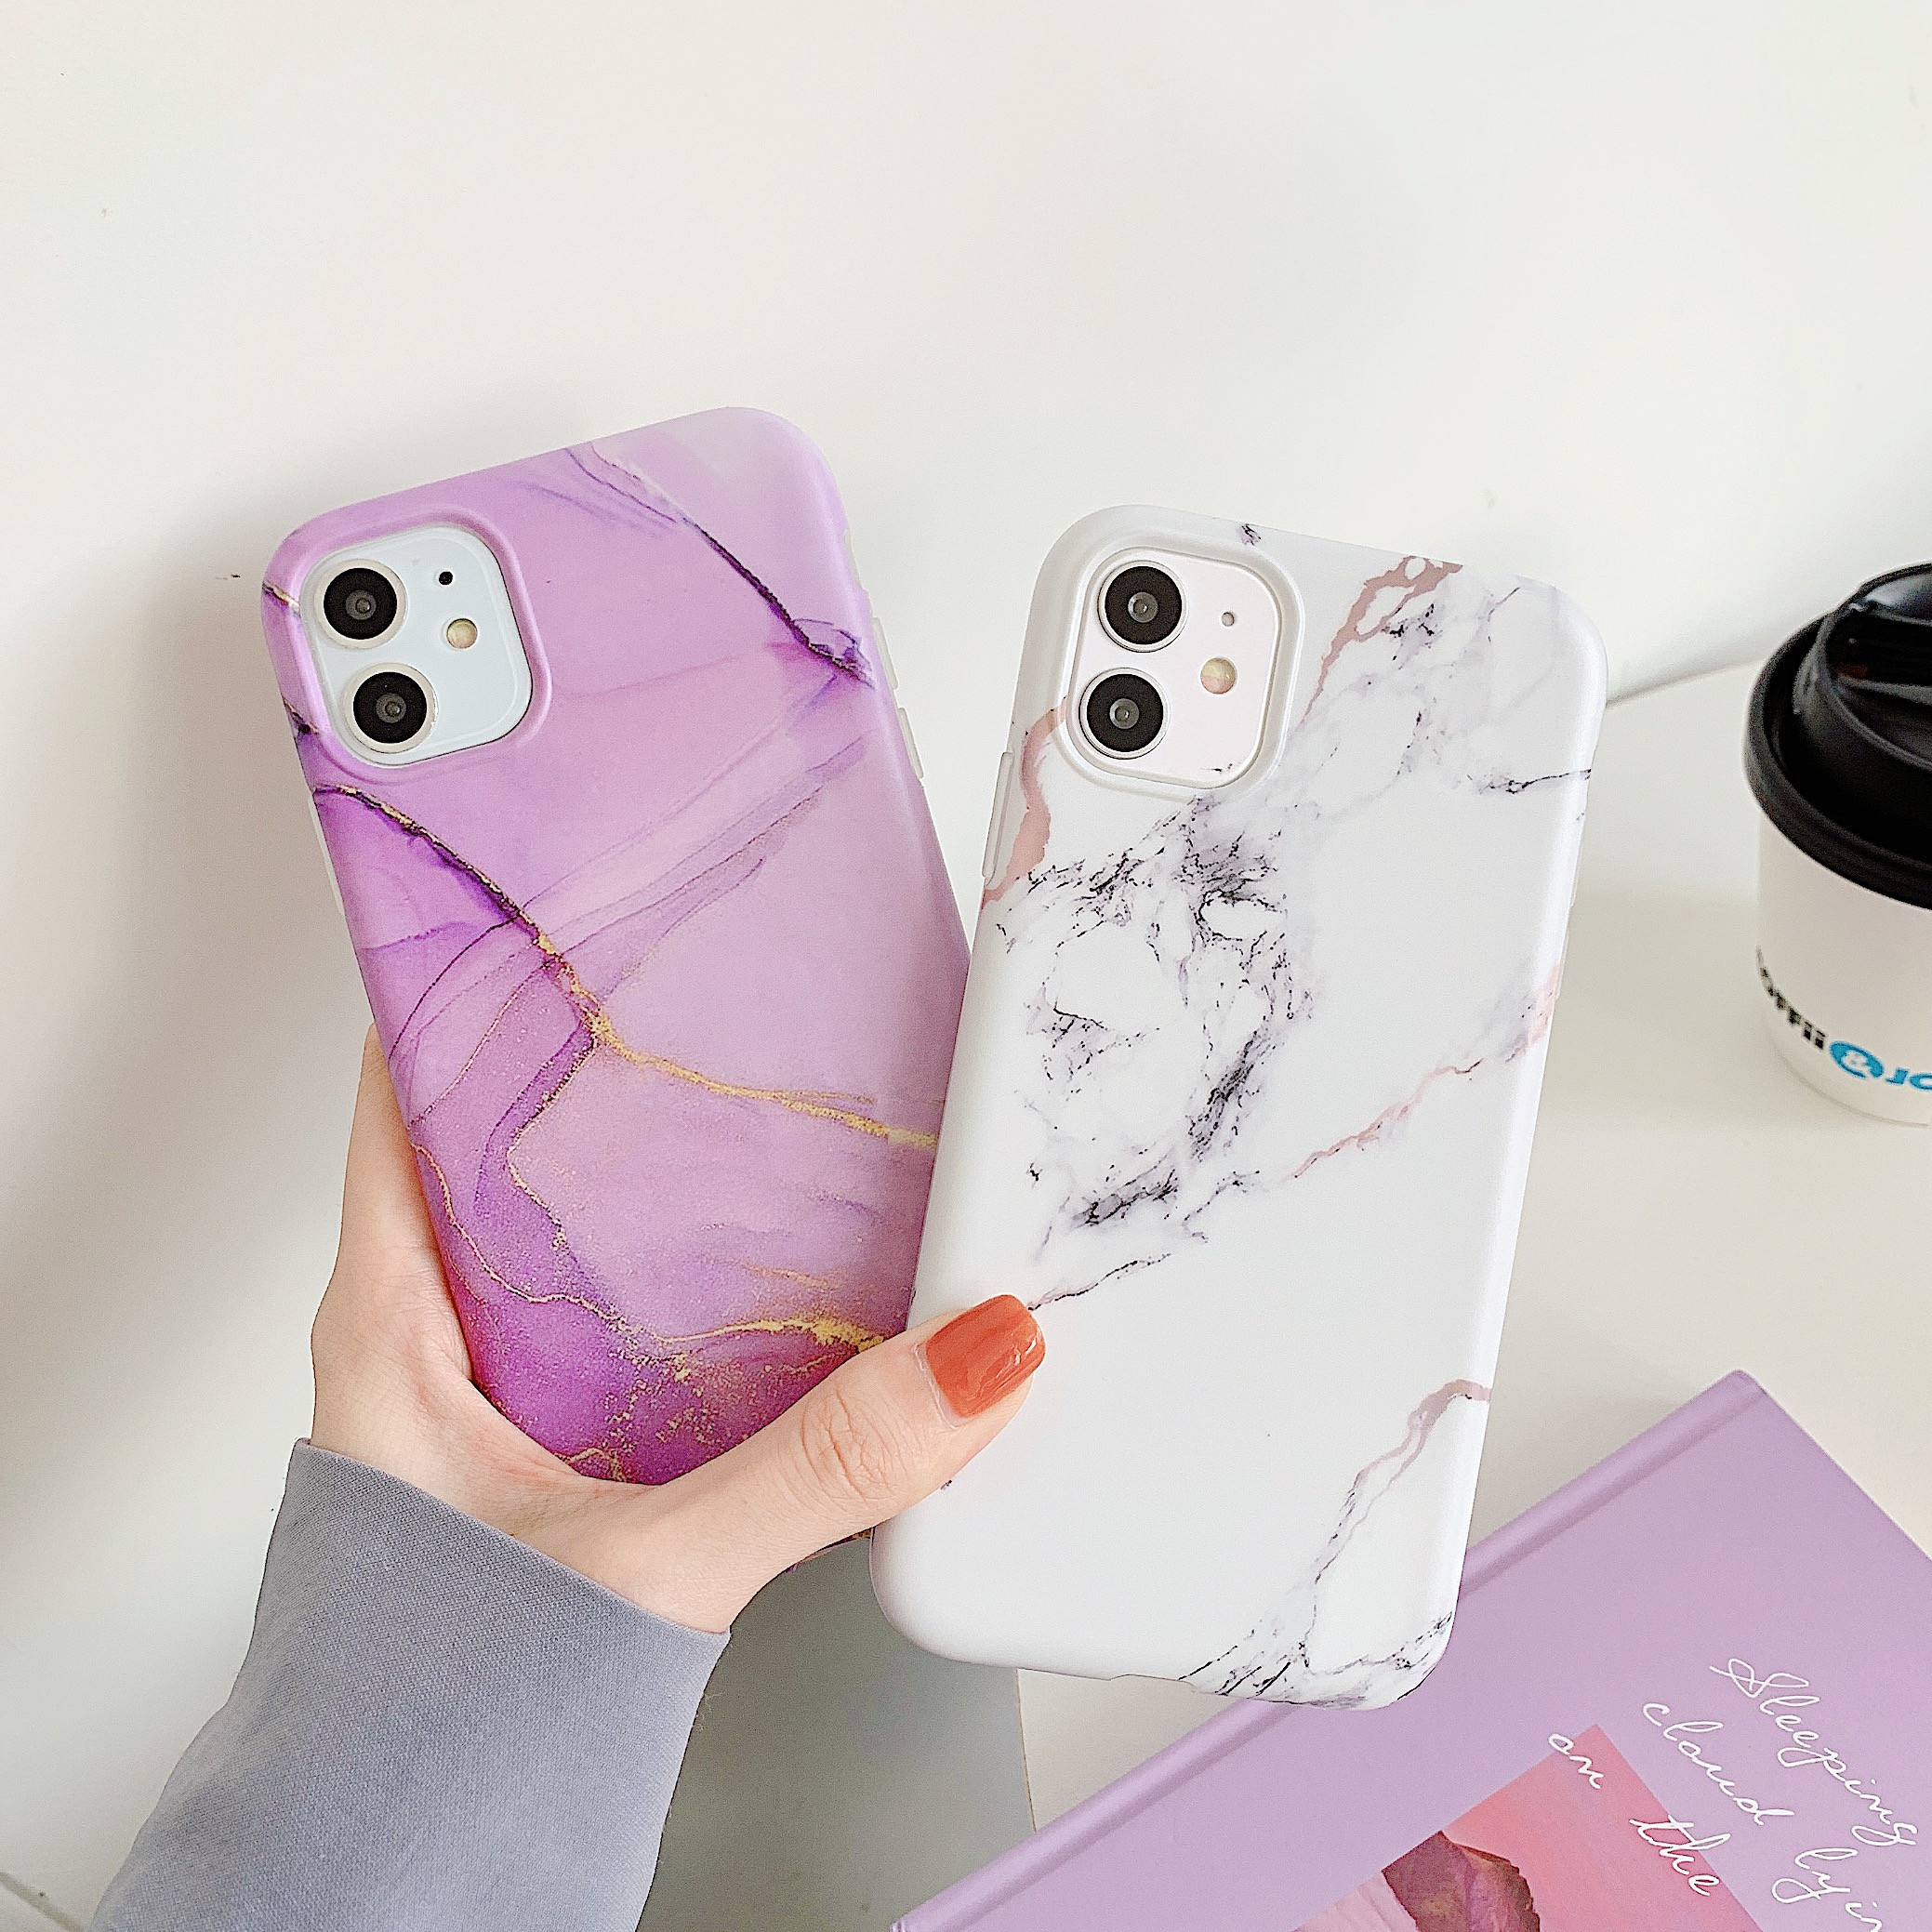 Haeb8fcb5a4bf4263b0e9d9c46281cb4ek Capinha celular case Mármore rachadura matte casos de telefone para iphone 12 mini 11 pro max se 2020 xs max xr x 7 8 plus capa de silicone macio tpu imd volta